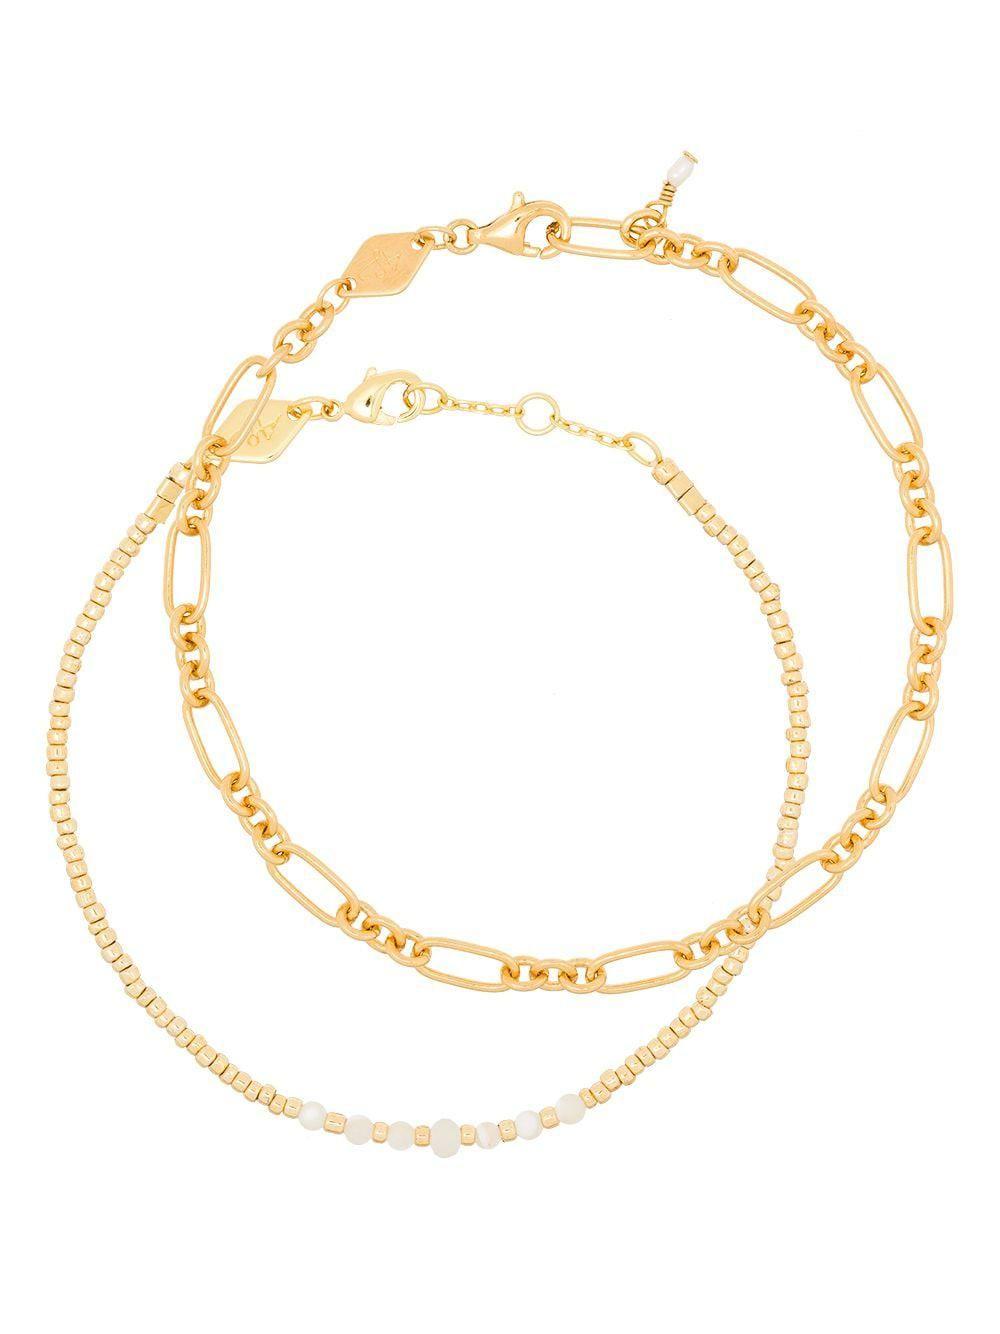 anni lu clemence sun stalker bracelet set